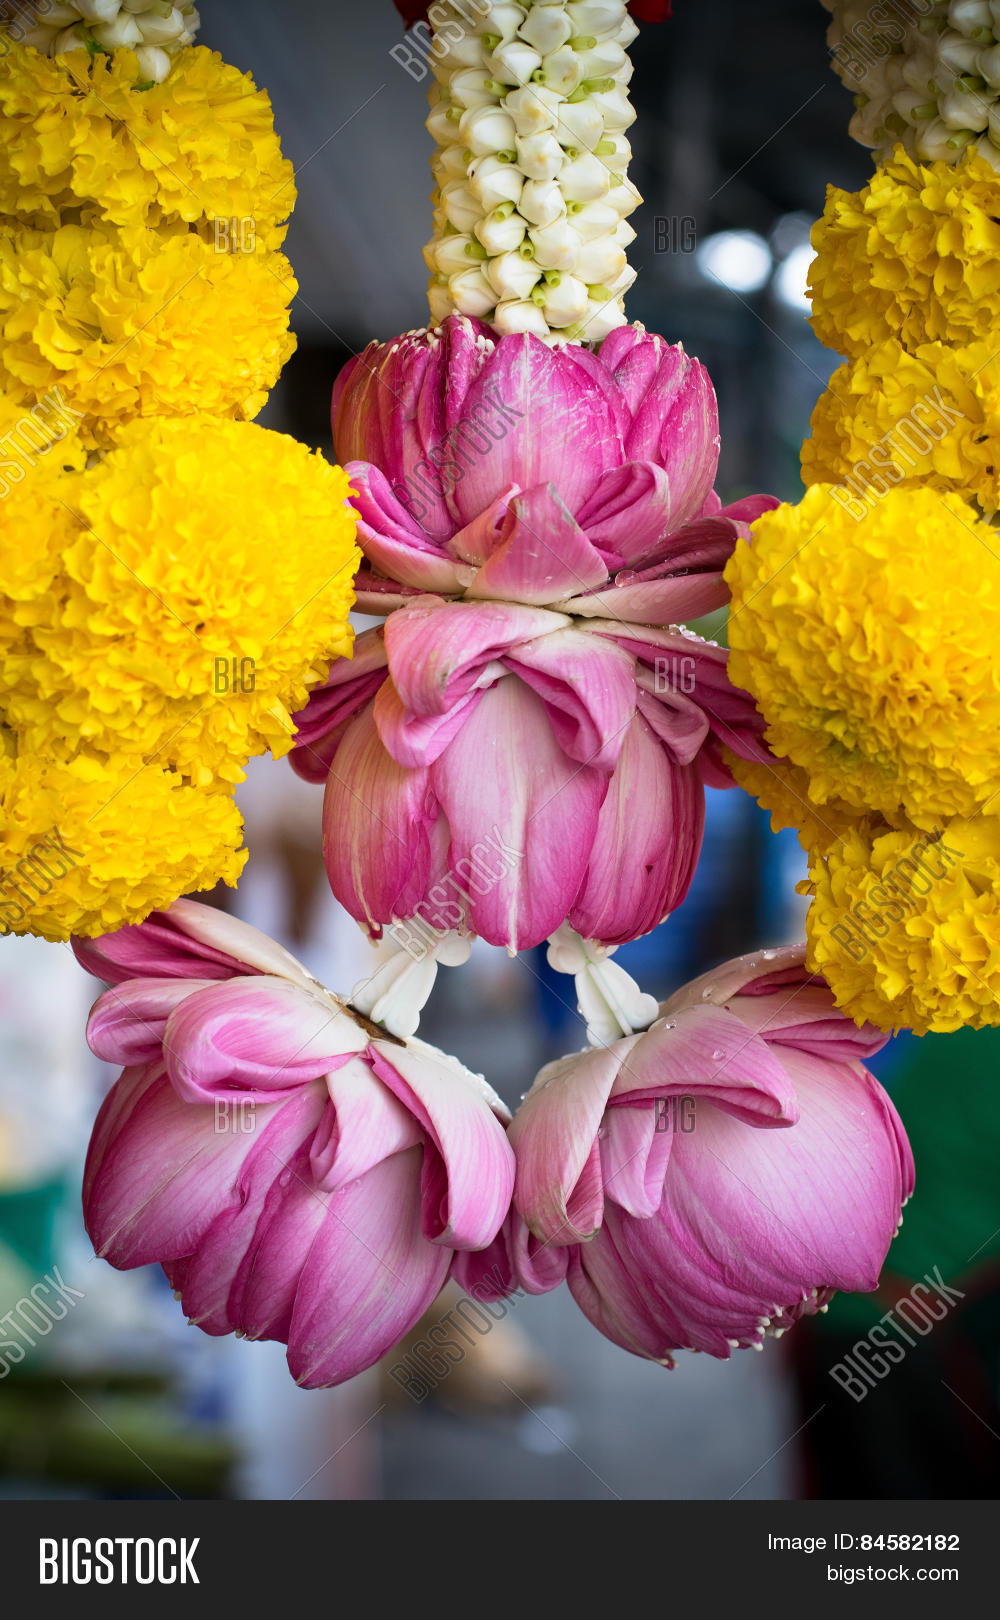 Pink Lotus Flowers Image Photo Free Trial Bigstock